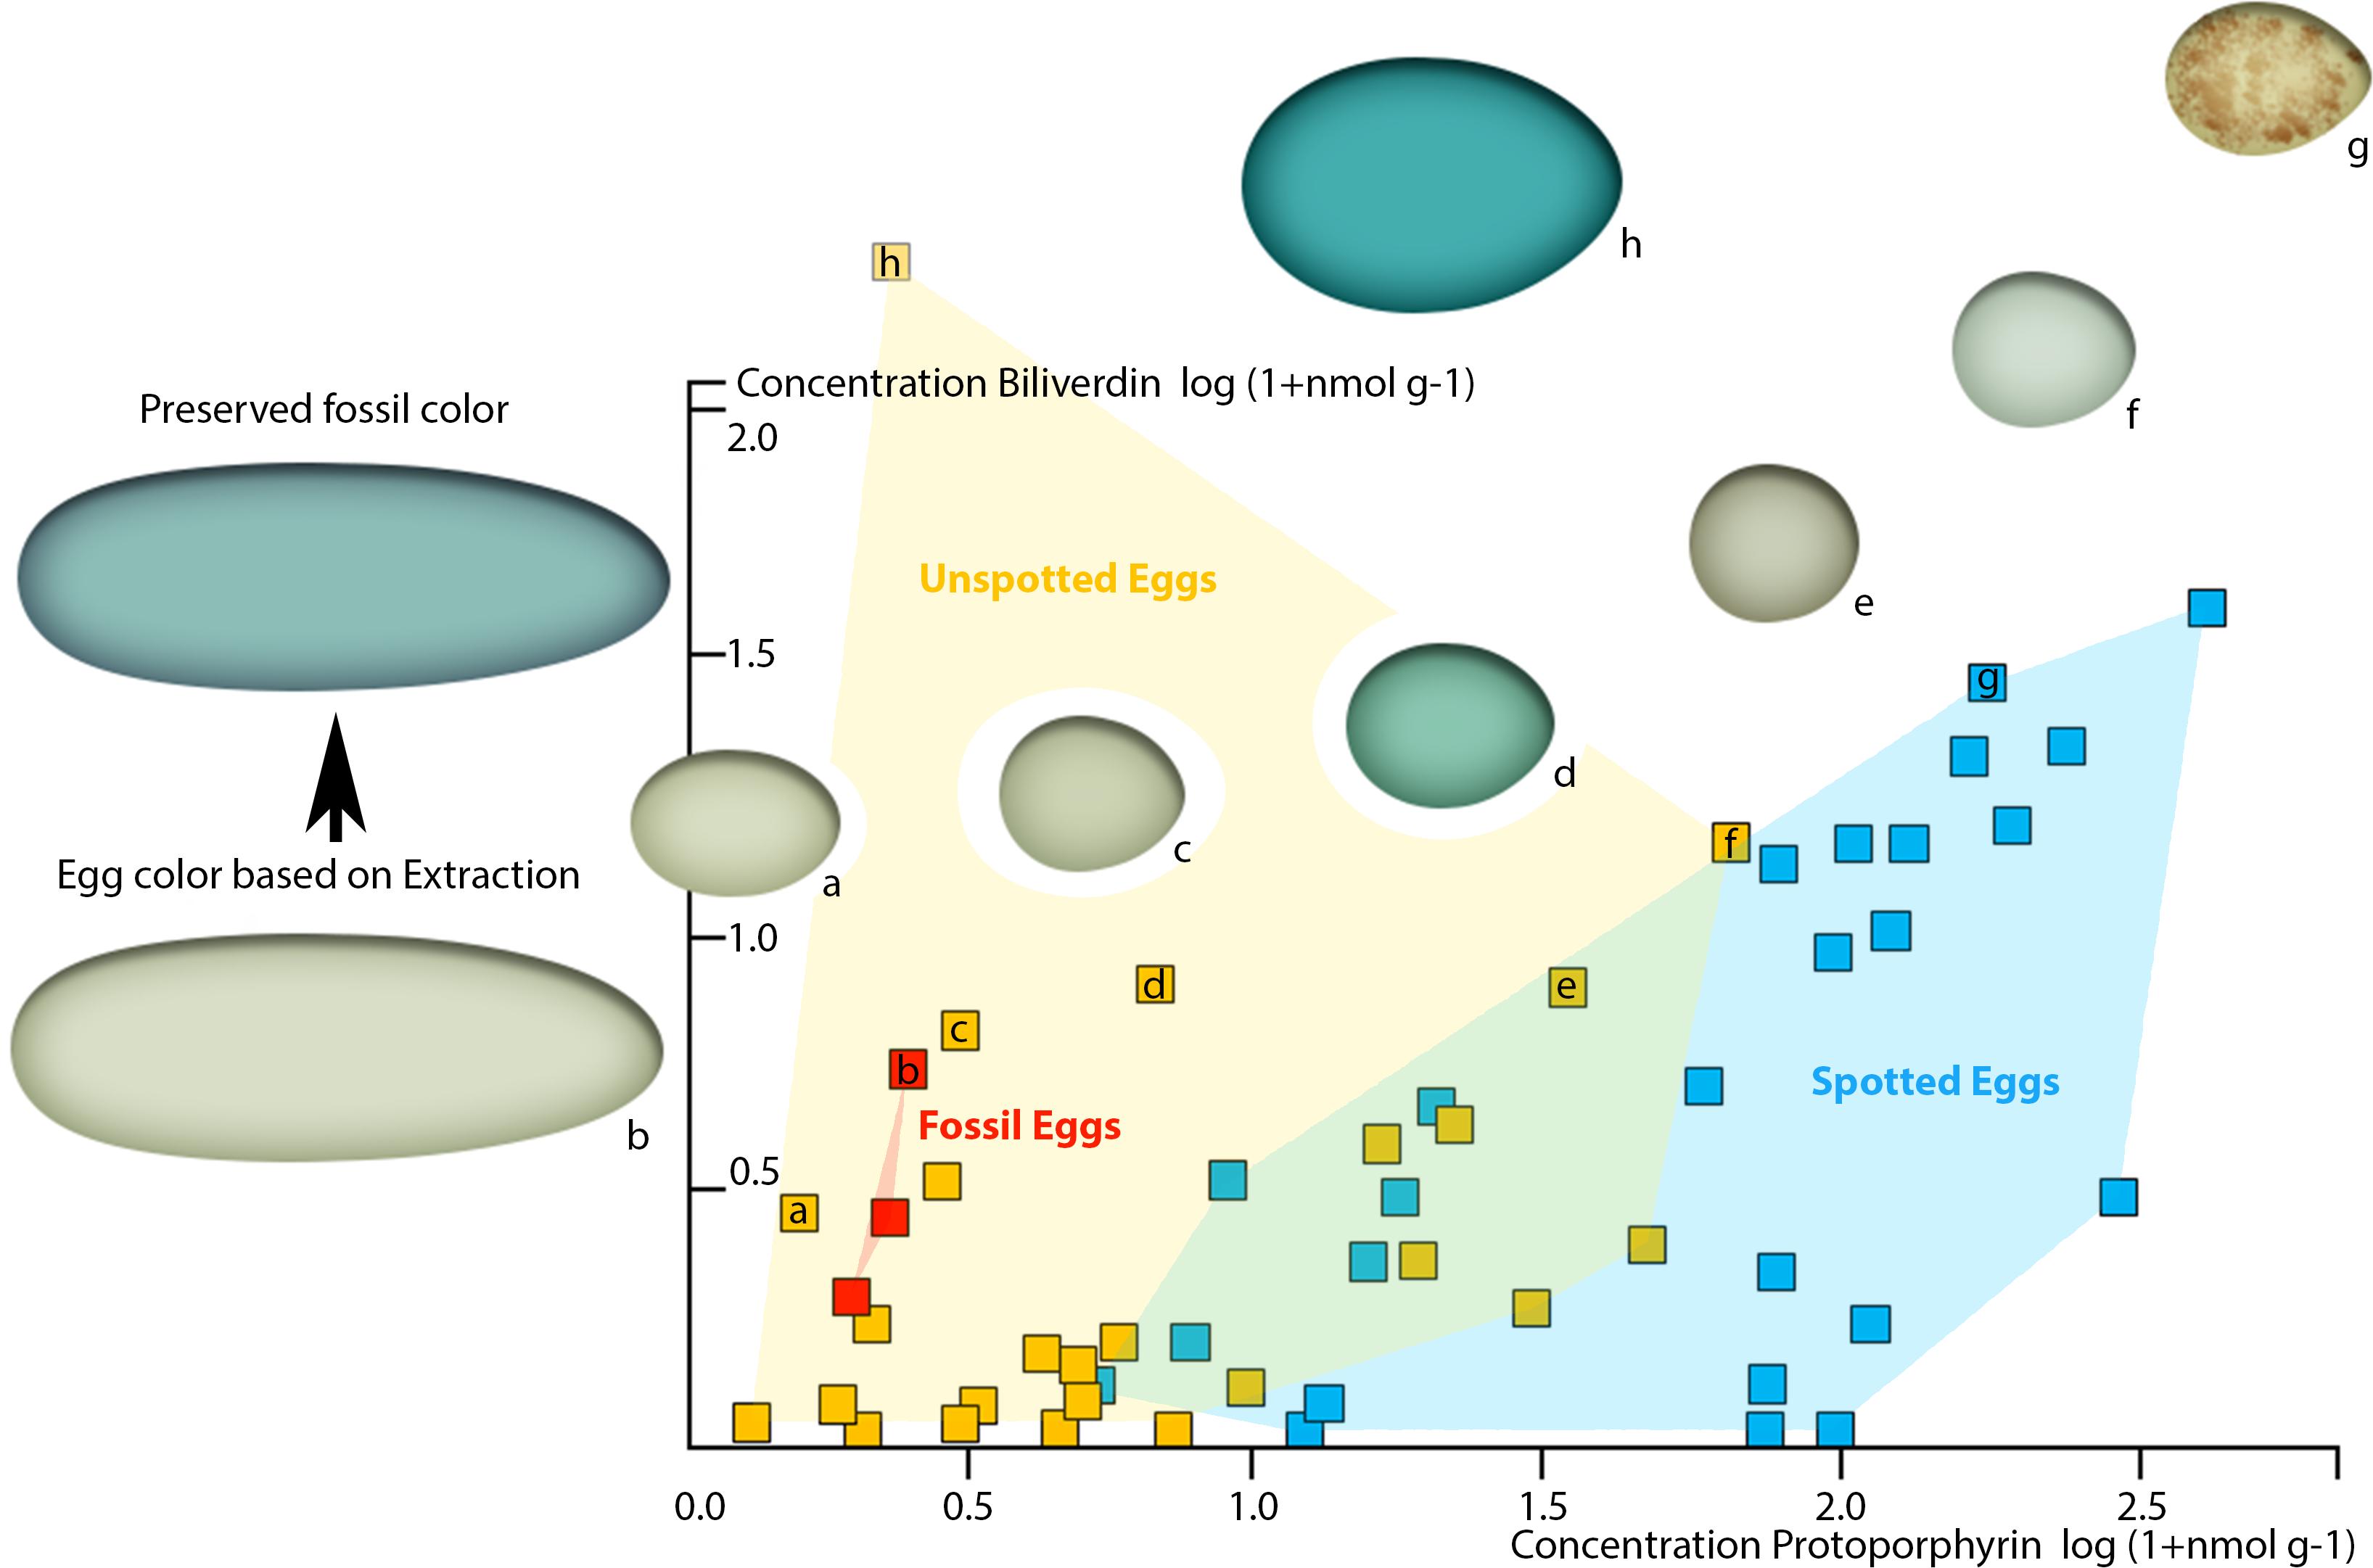 Dinosaur origin of egg color oviraptors laid blue green eggs peerj download full size image pooptronica